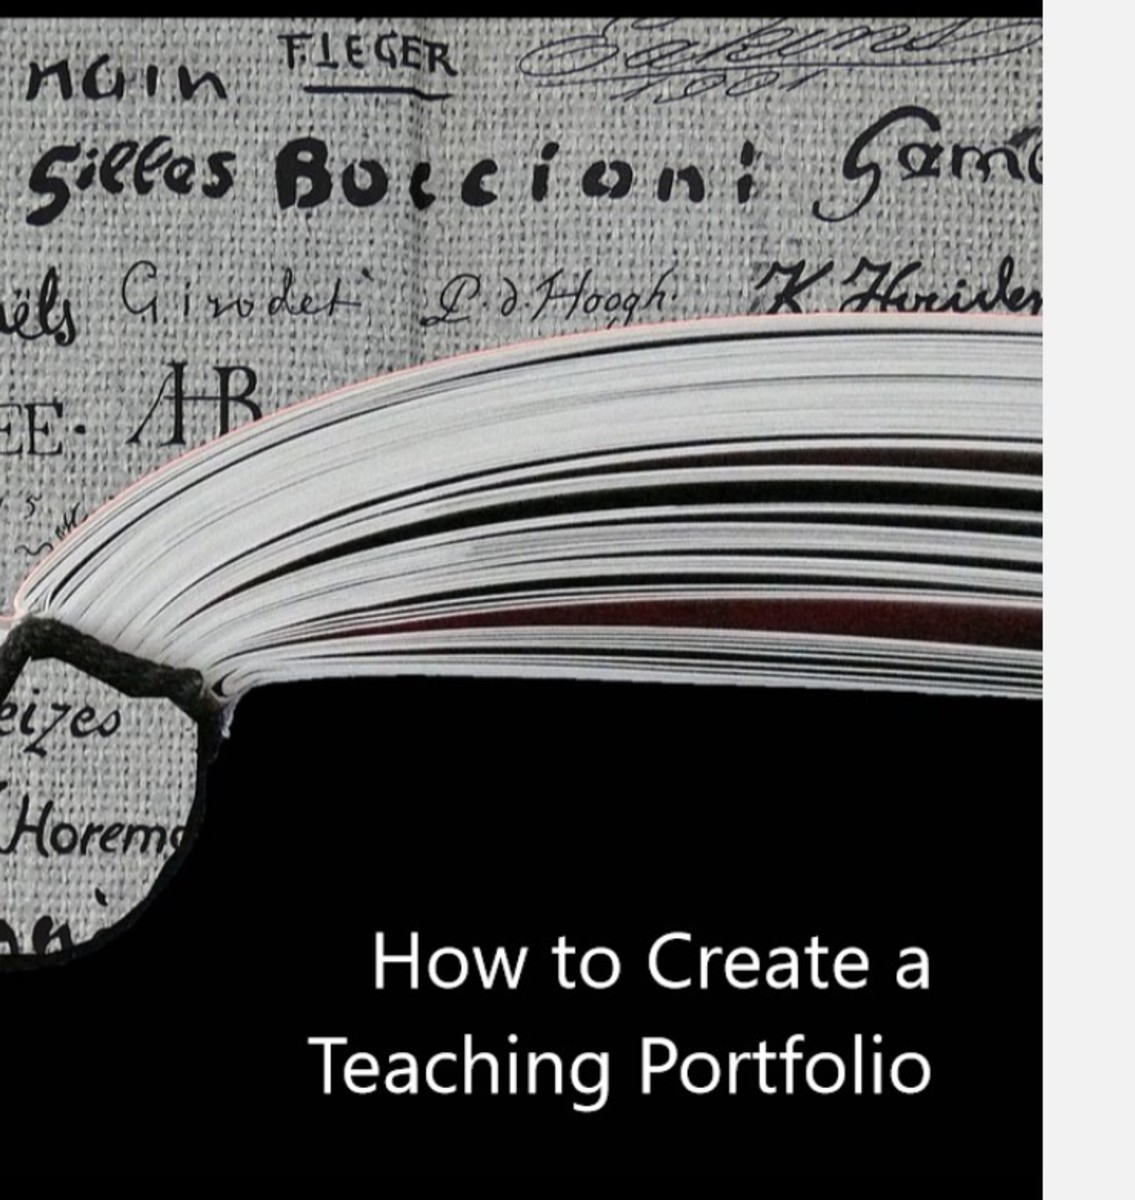 How to Create a Teaching Portfolio